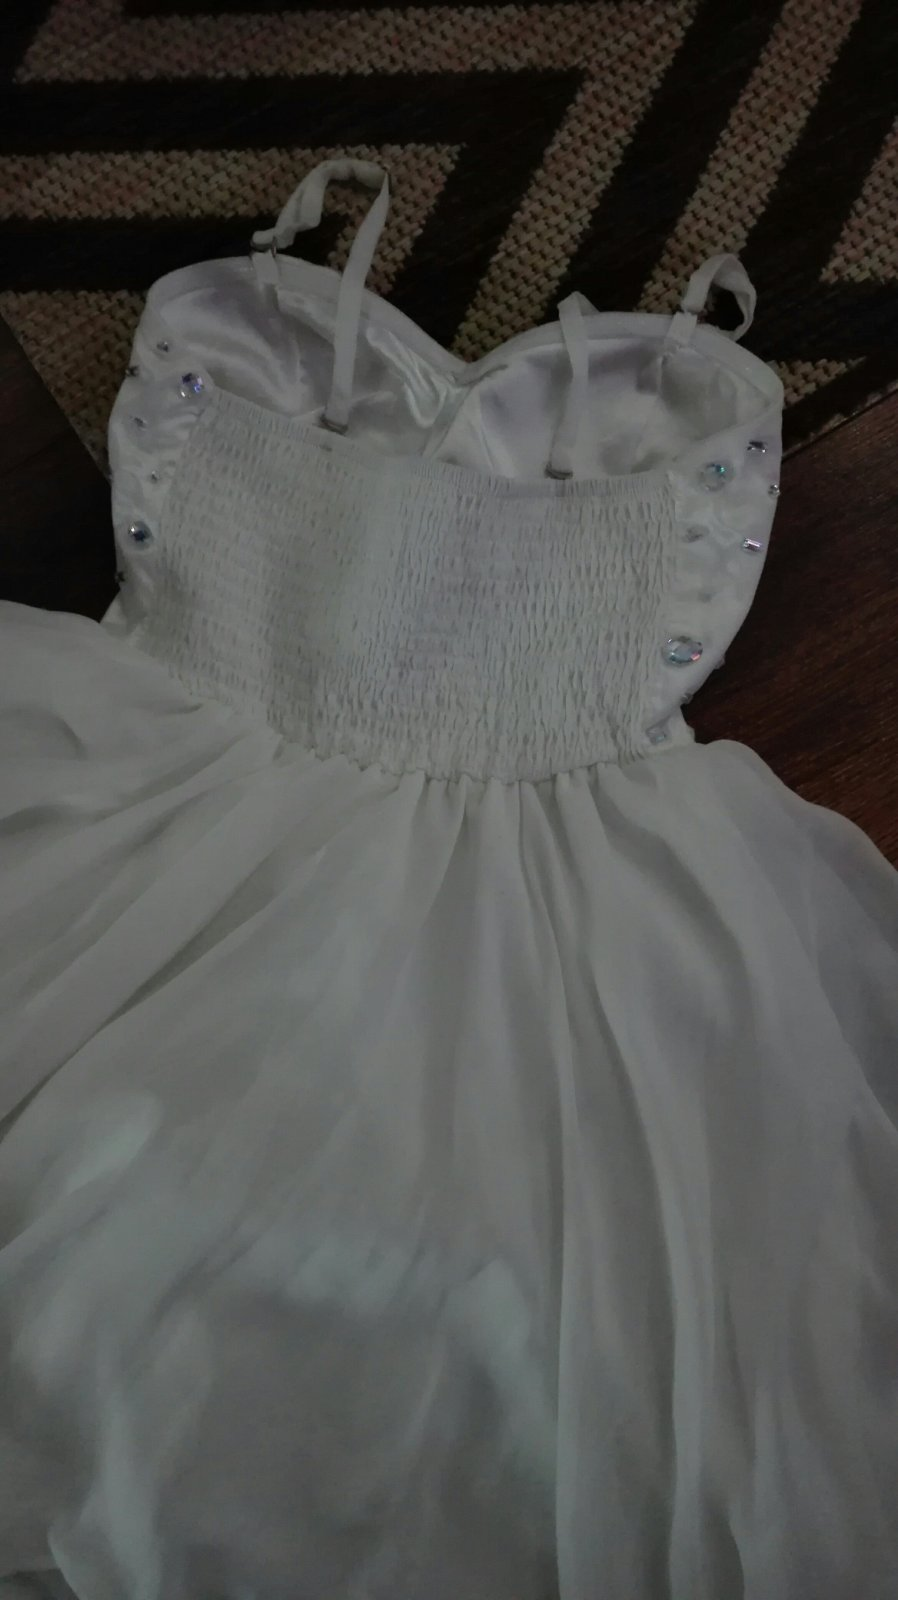 biele šaty - Obrázok č. 2